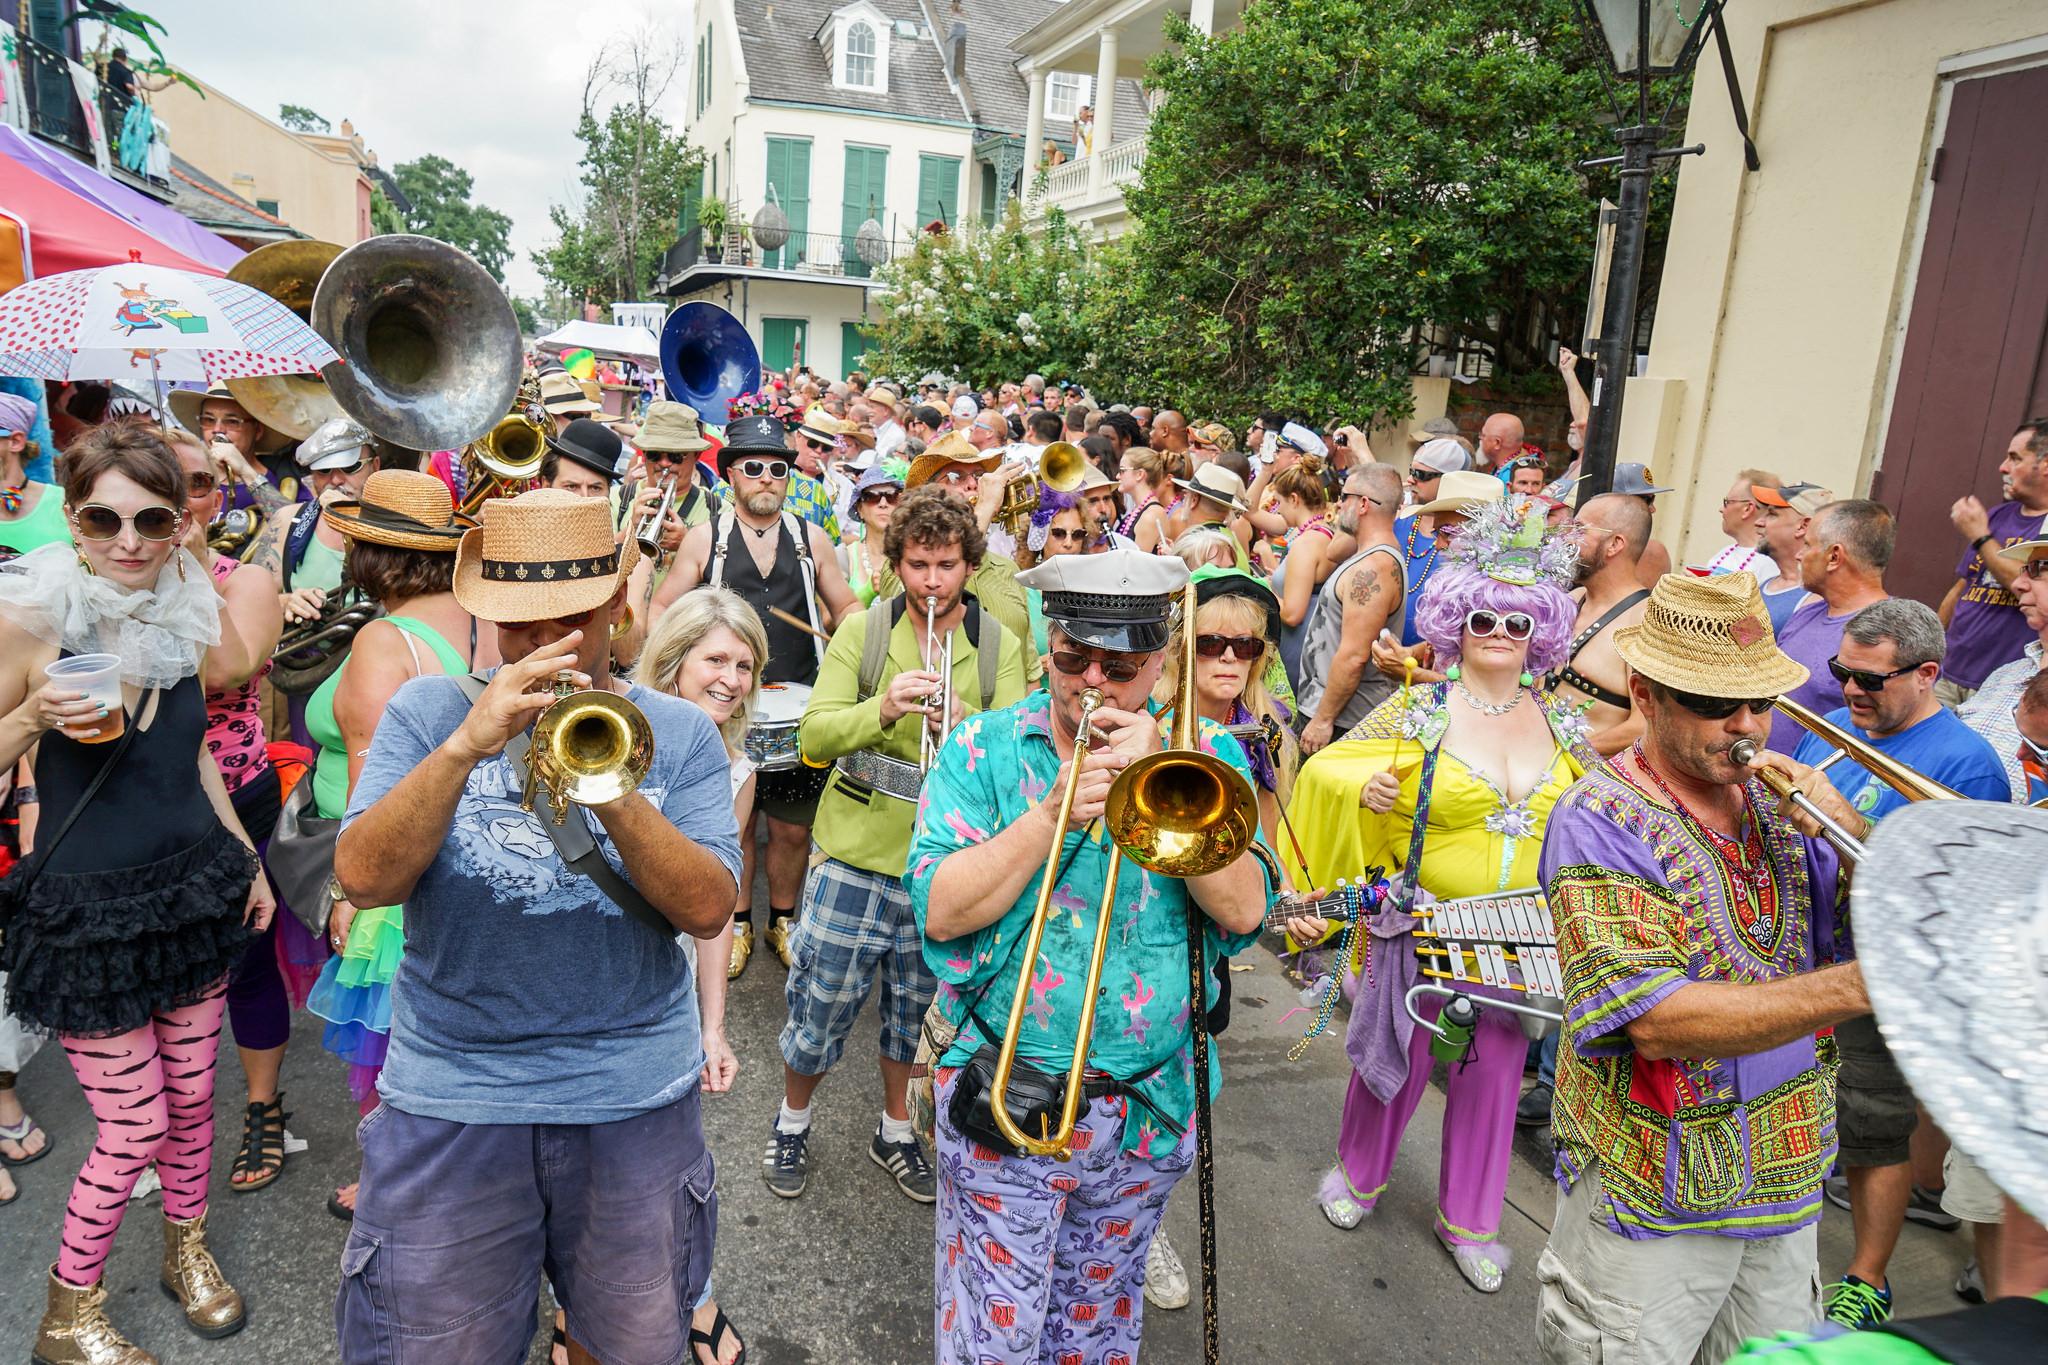 Southern Decadence Parade (Photo: Paul Broussard)